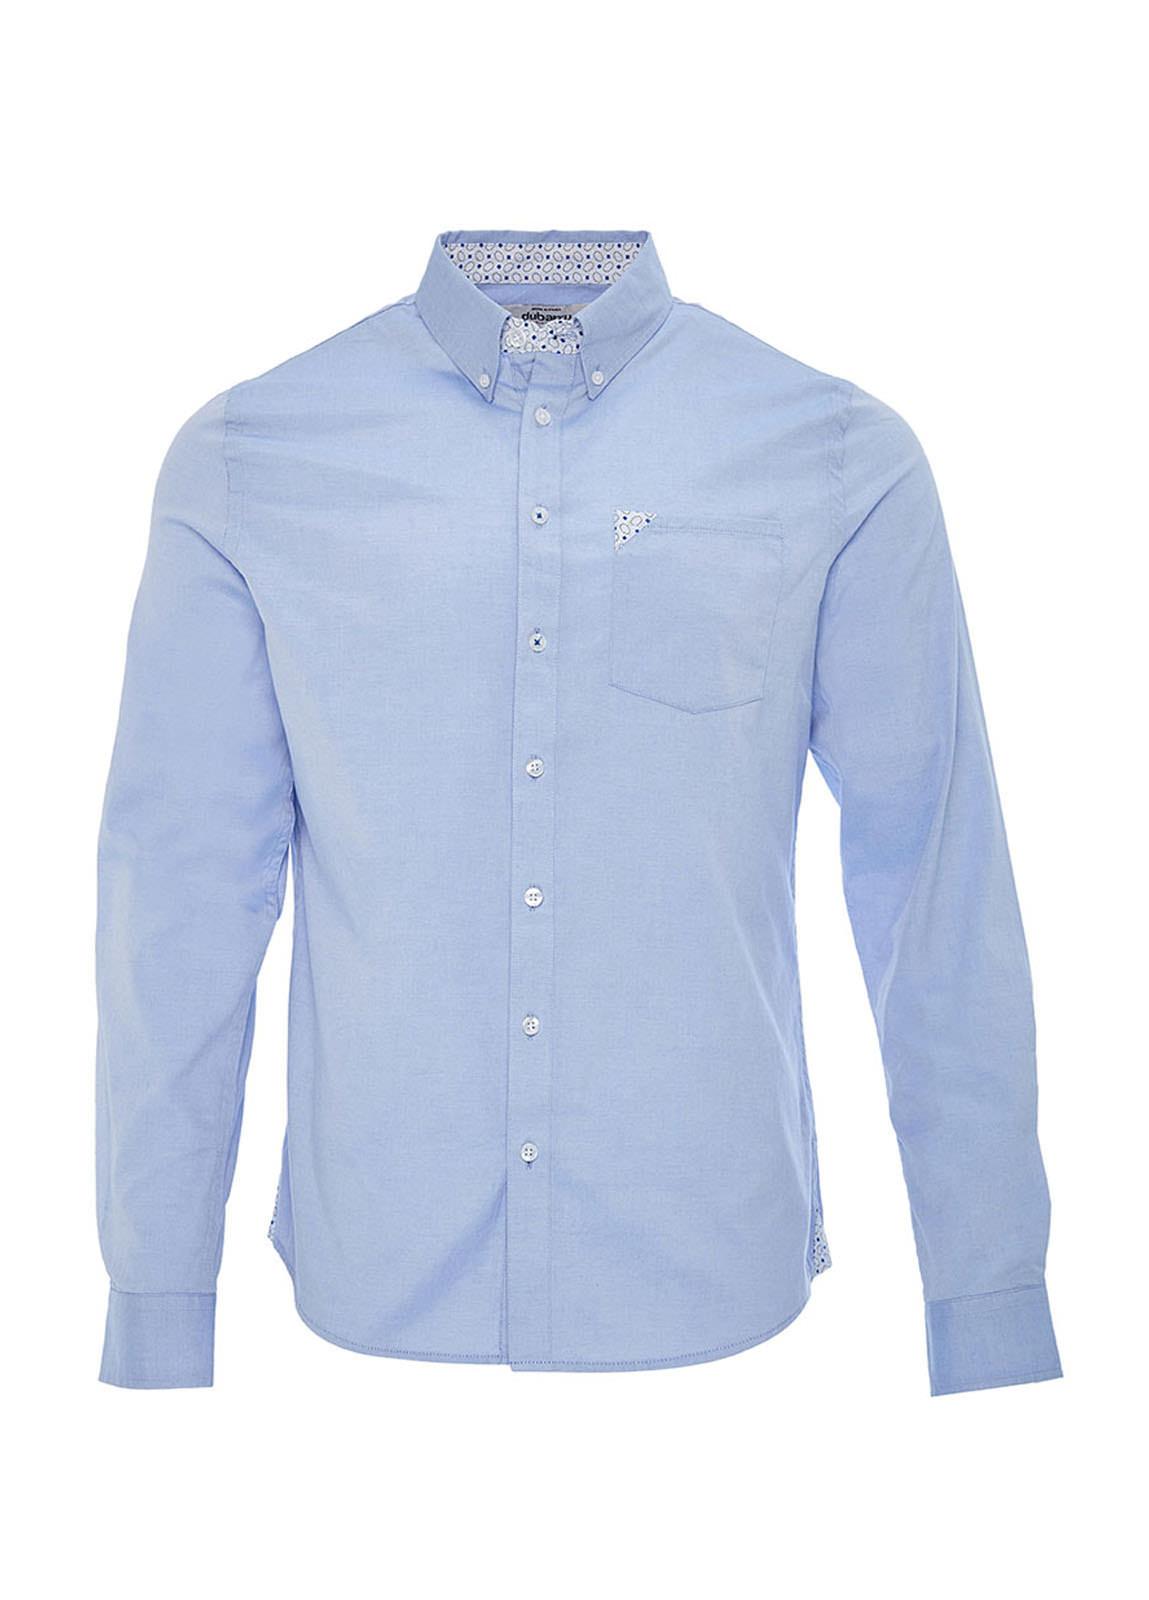 Dubarry_ Rathdrum Pinpoint Oxford Shirt - Blue_Image_2